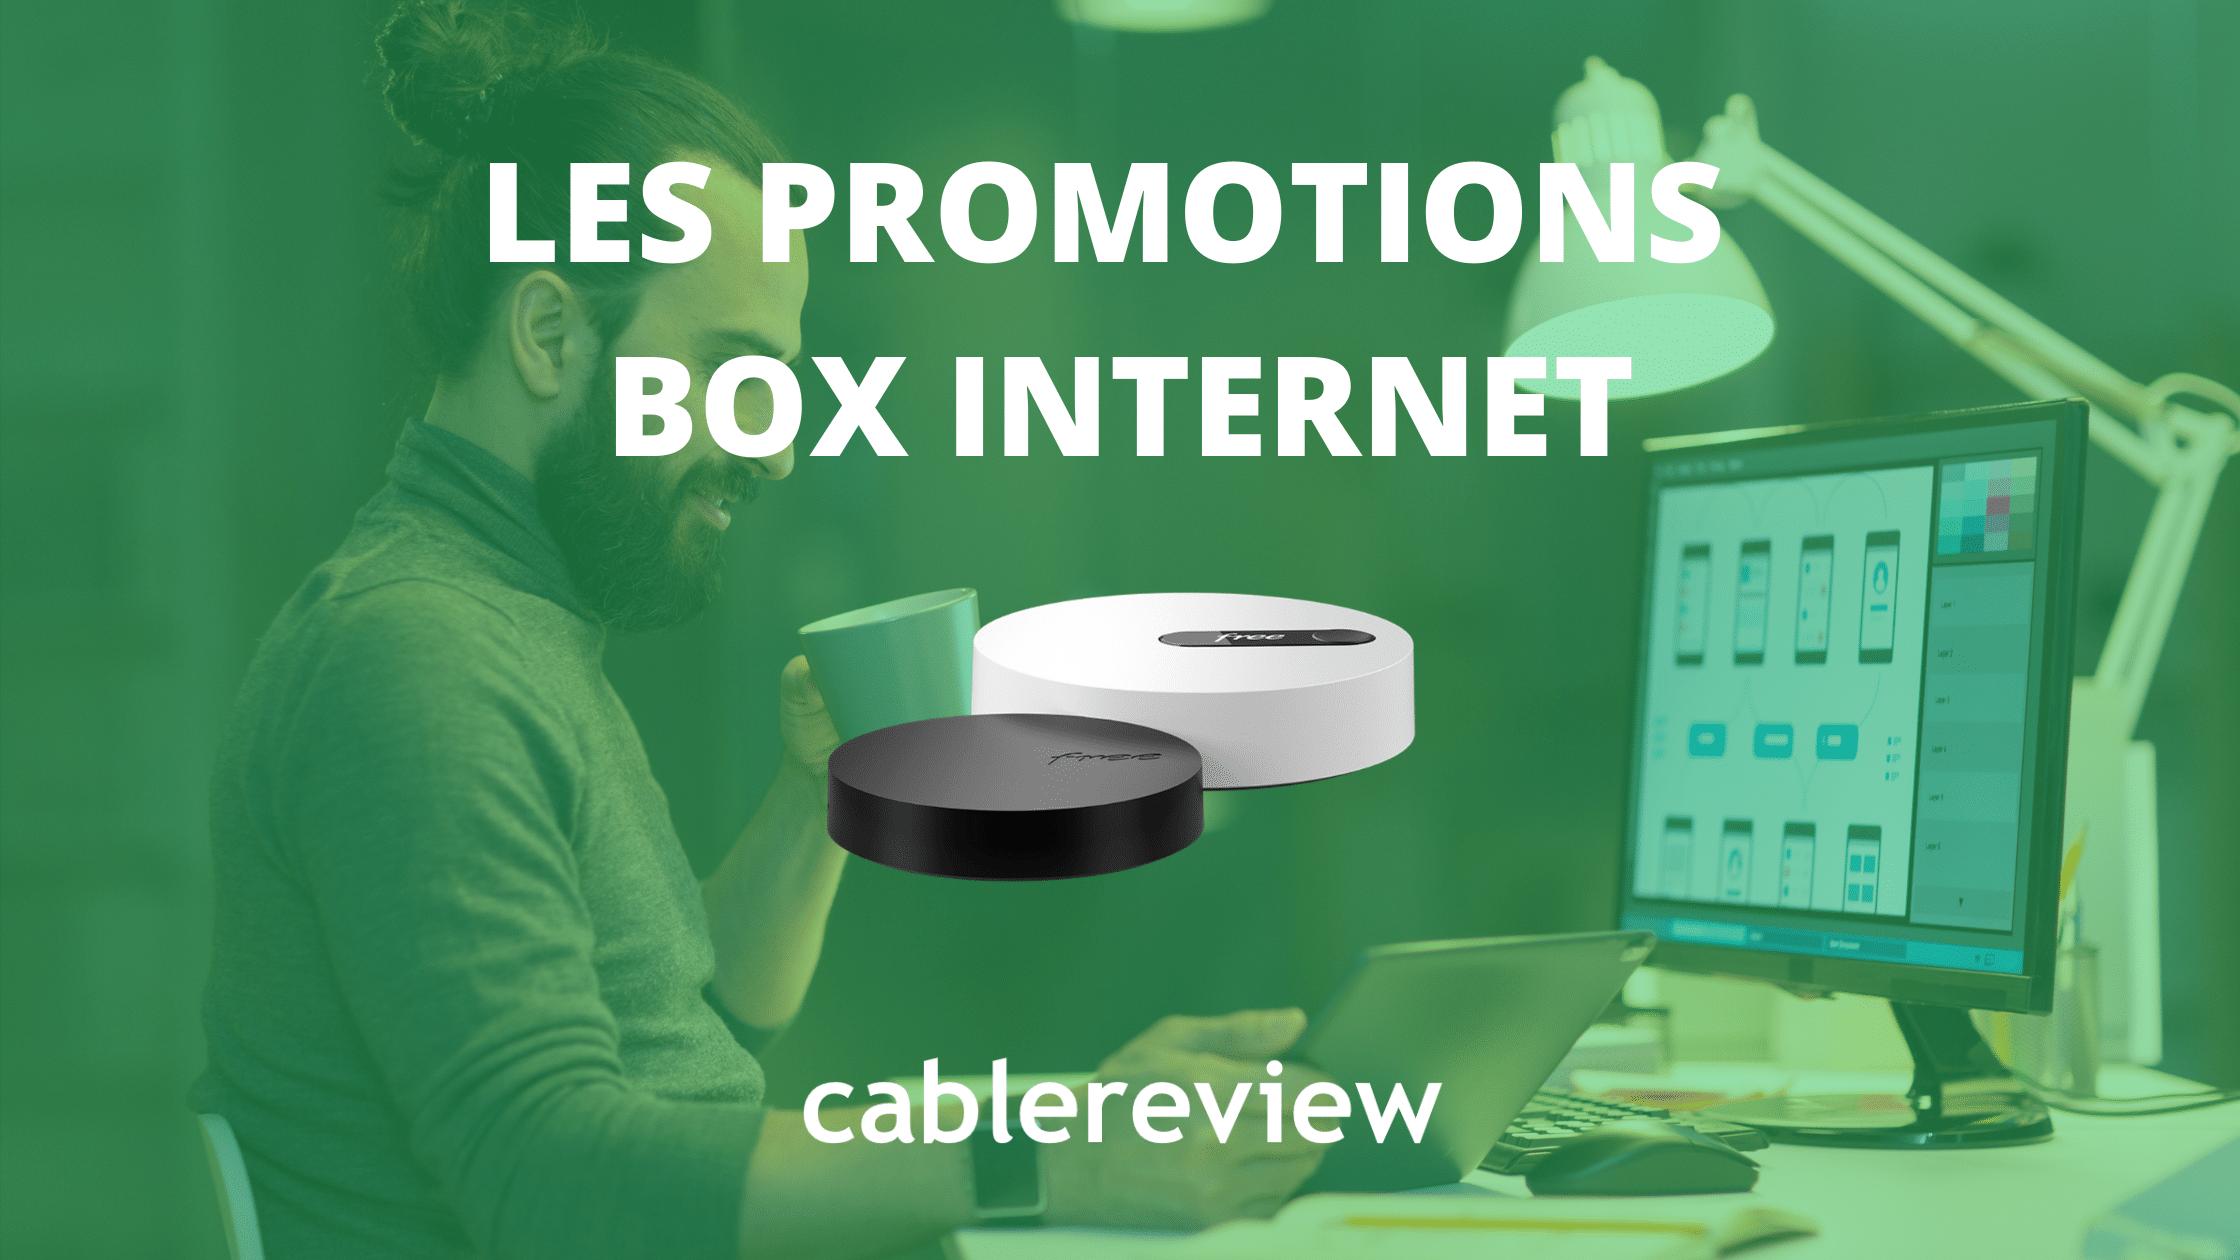 Promos box internet 2021-2